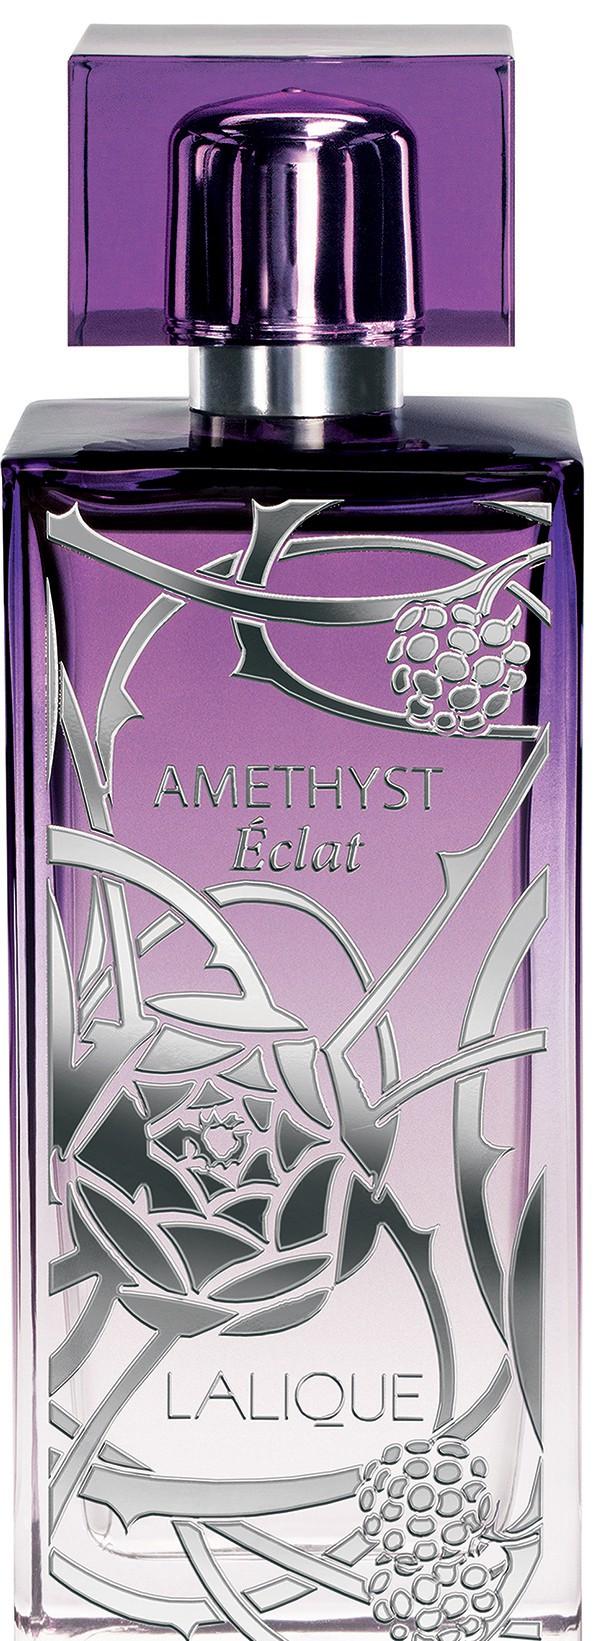 Lalique Amethyst Eclat аромат для женщин